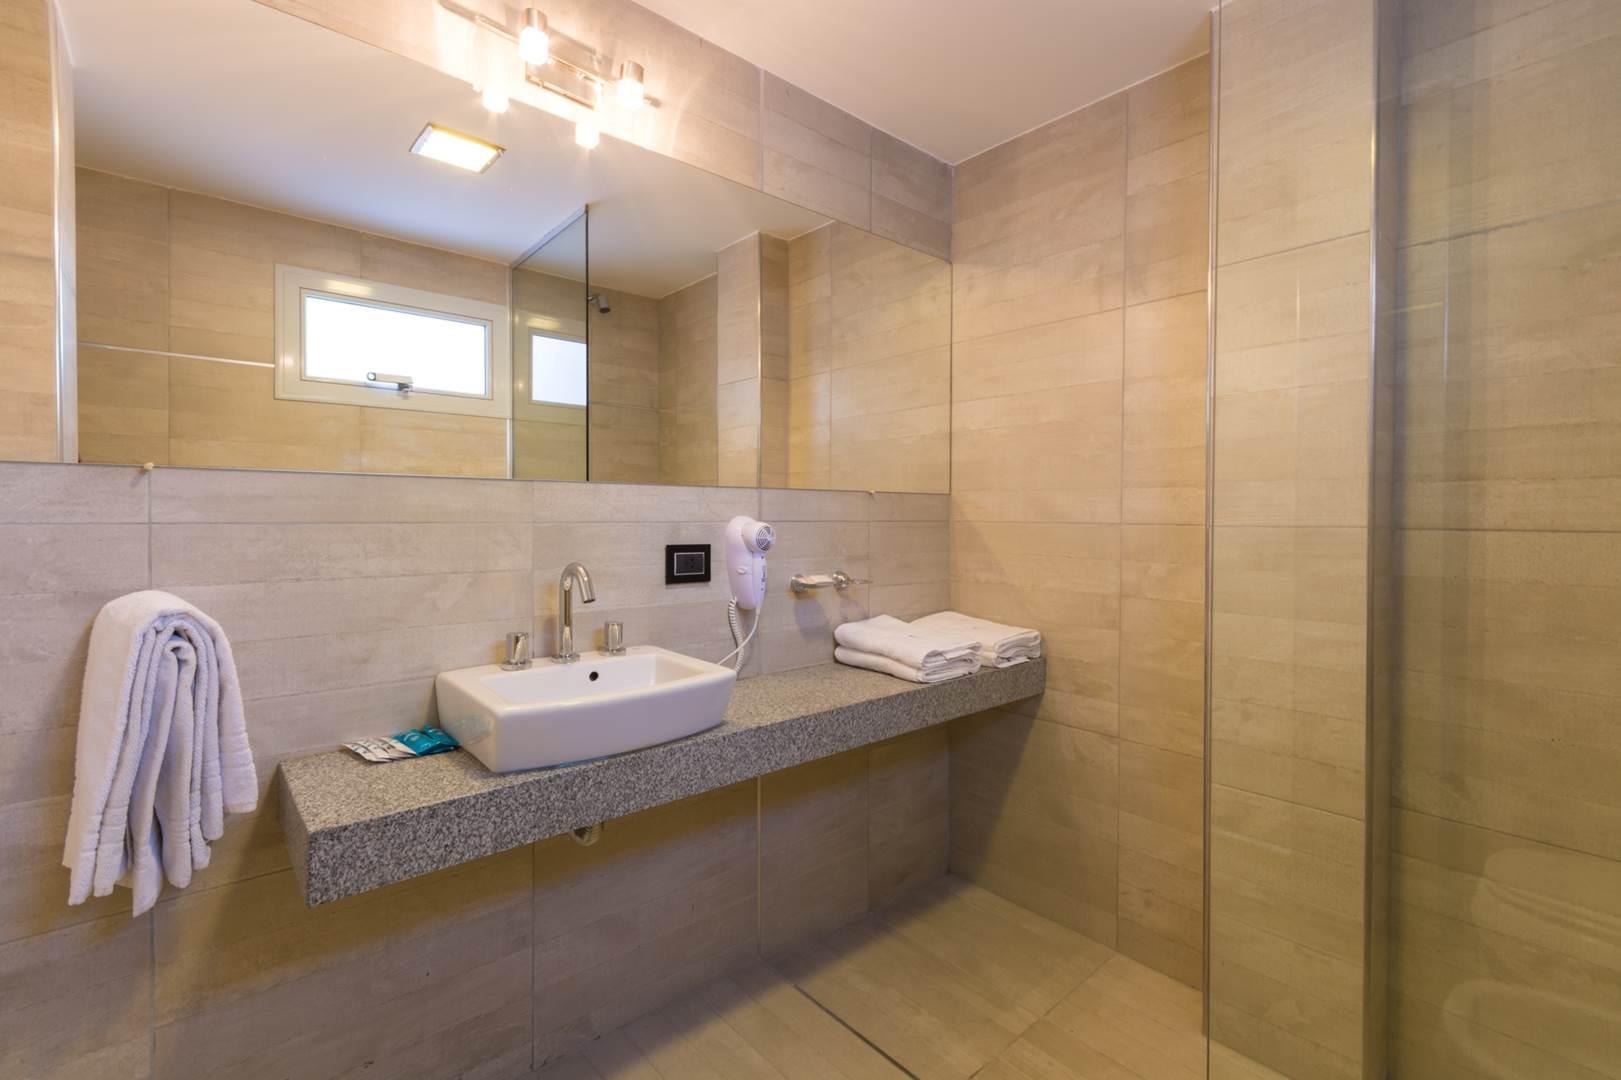 100917  -  HOTEL ALPRE ph1 G Viramonte-1677 (Copy)